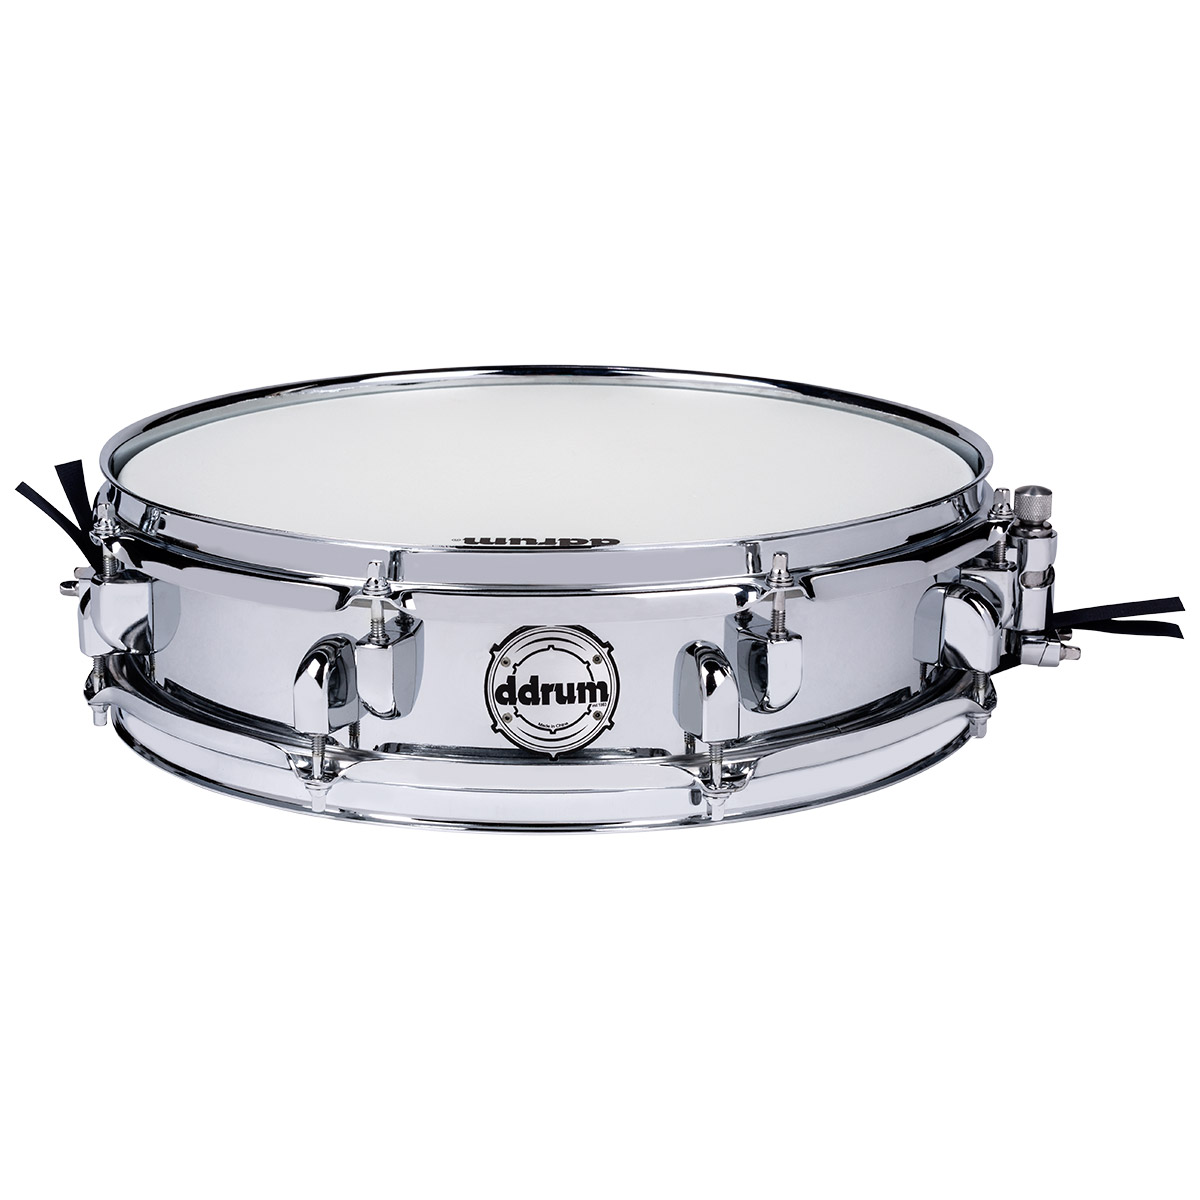 ddrum MT SD 3.5X14 STEEL Modern Tone 3.5x14 Steel piccolo snare by ddrum